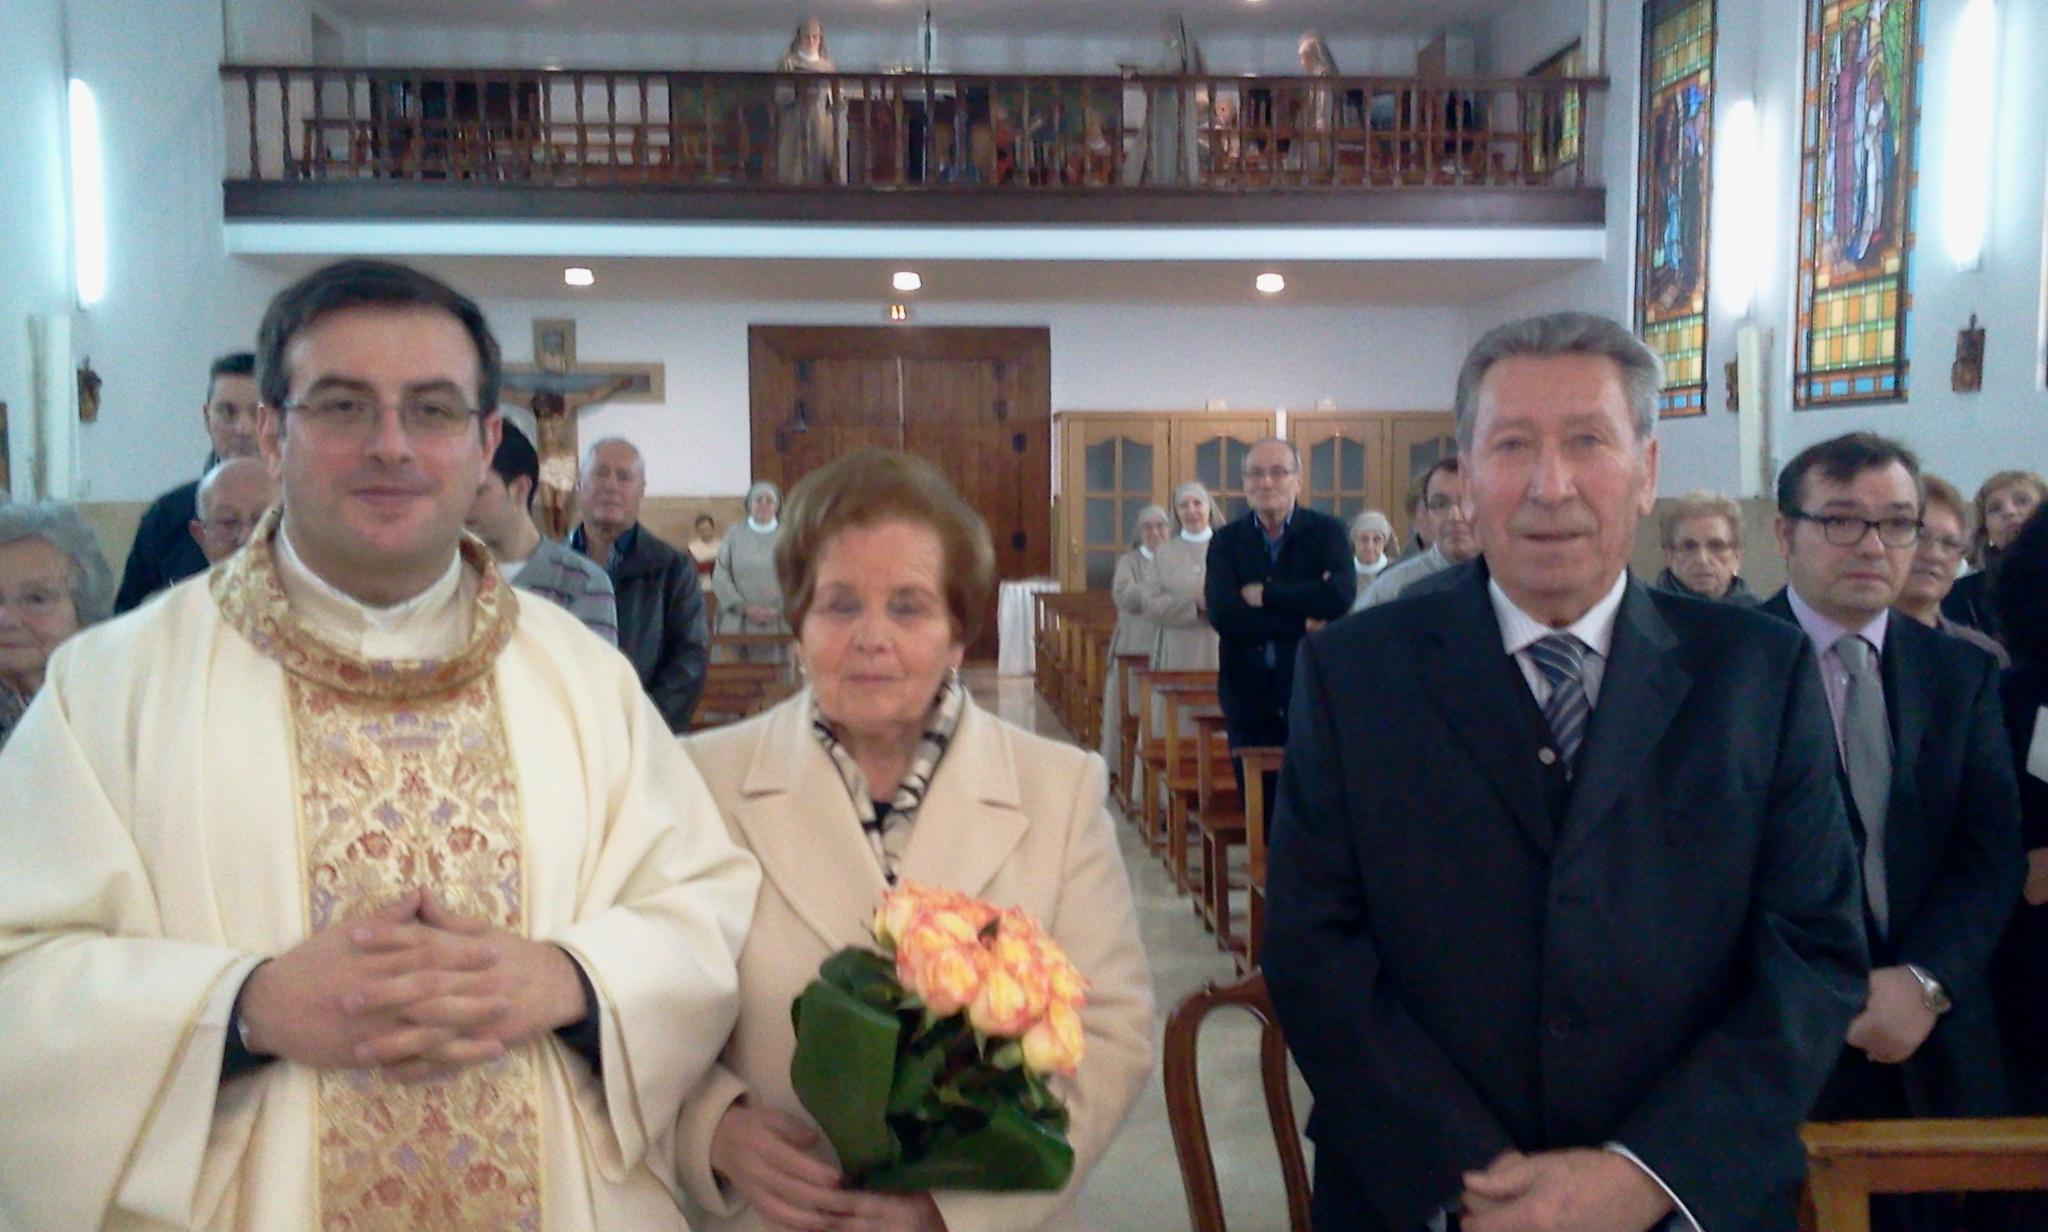 Matrimonio Catolico Misa : Homilía en la misa por las bodas de oro matrimoniales de francisco